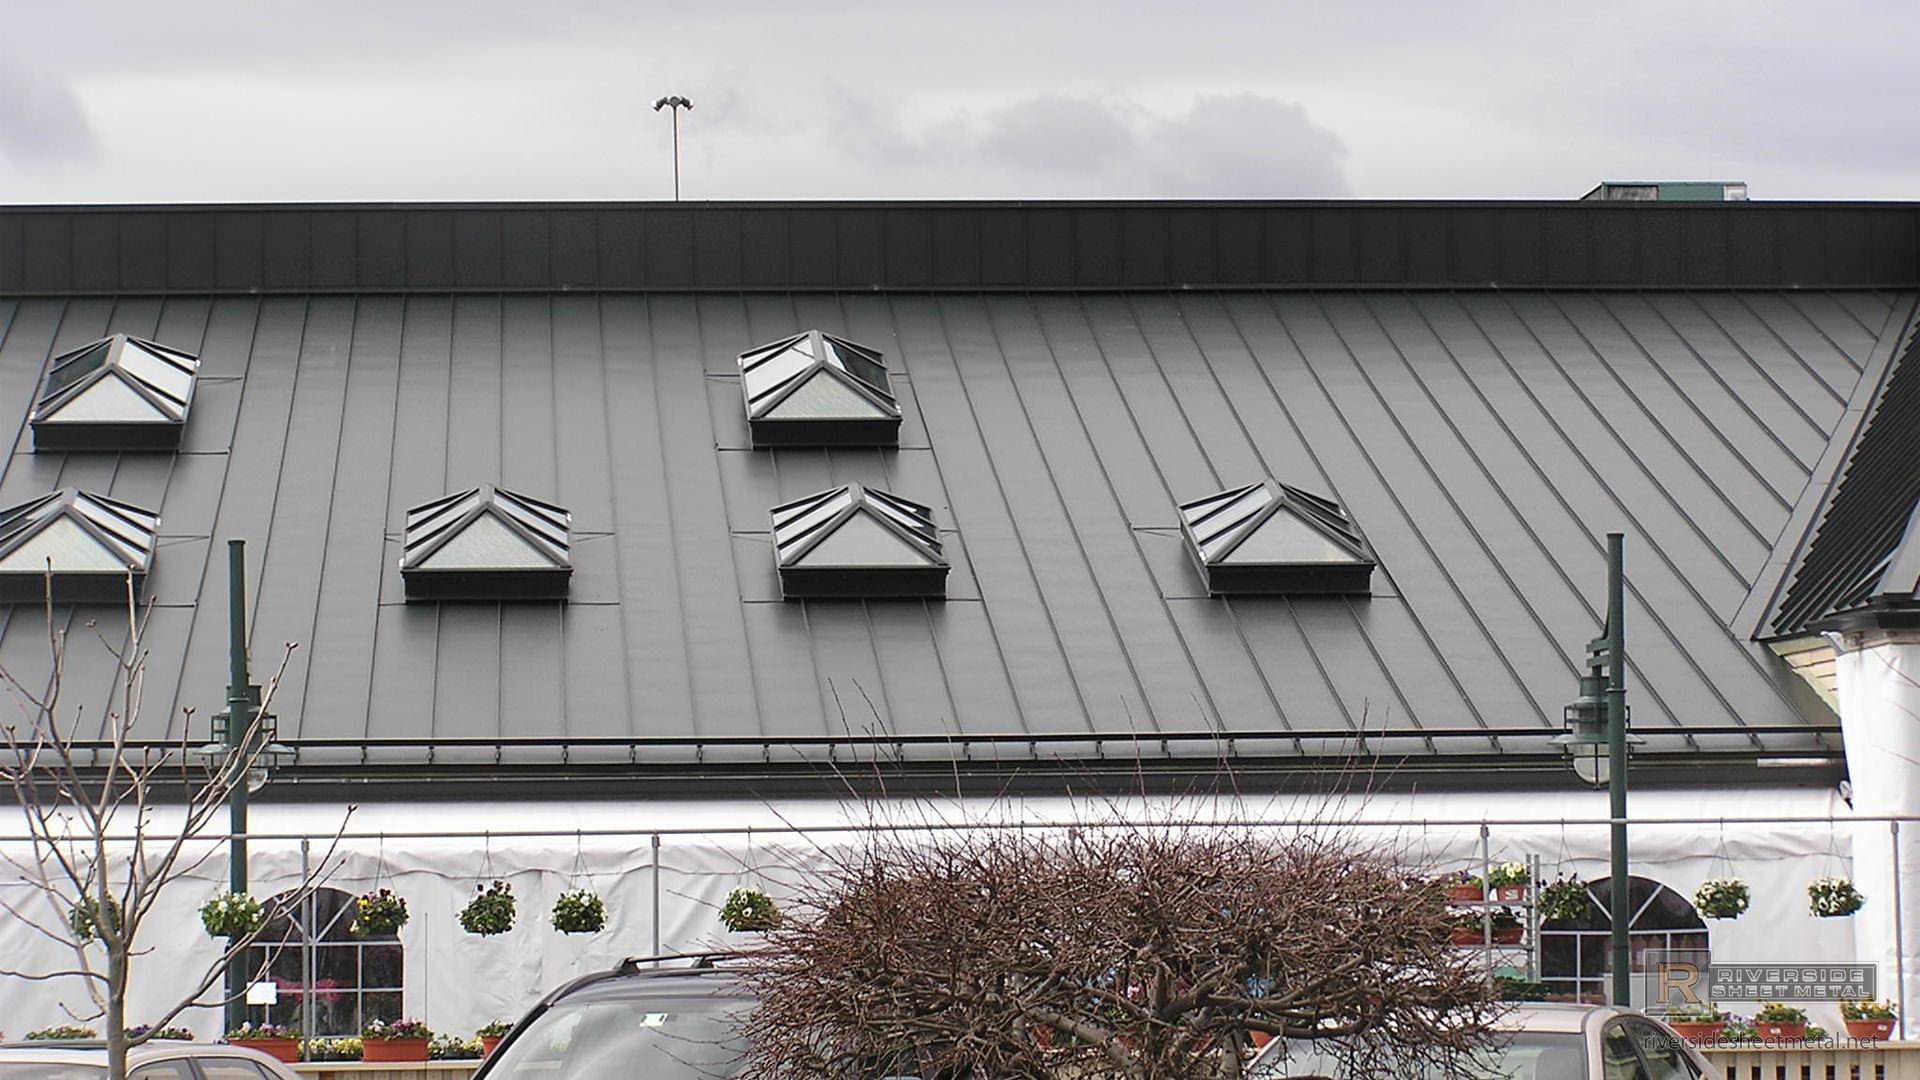 Bronze Aluminum Skylights On A Standing Seam Metal Roof